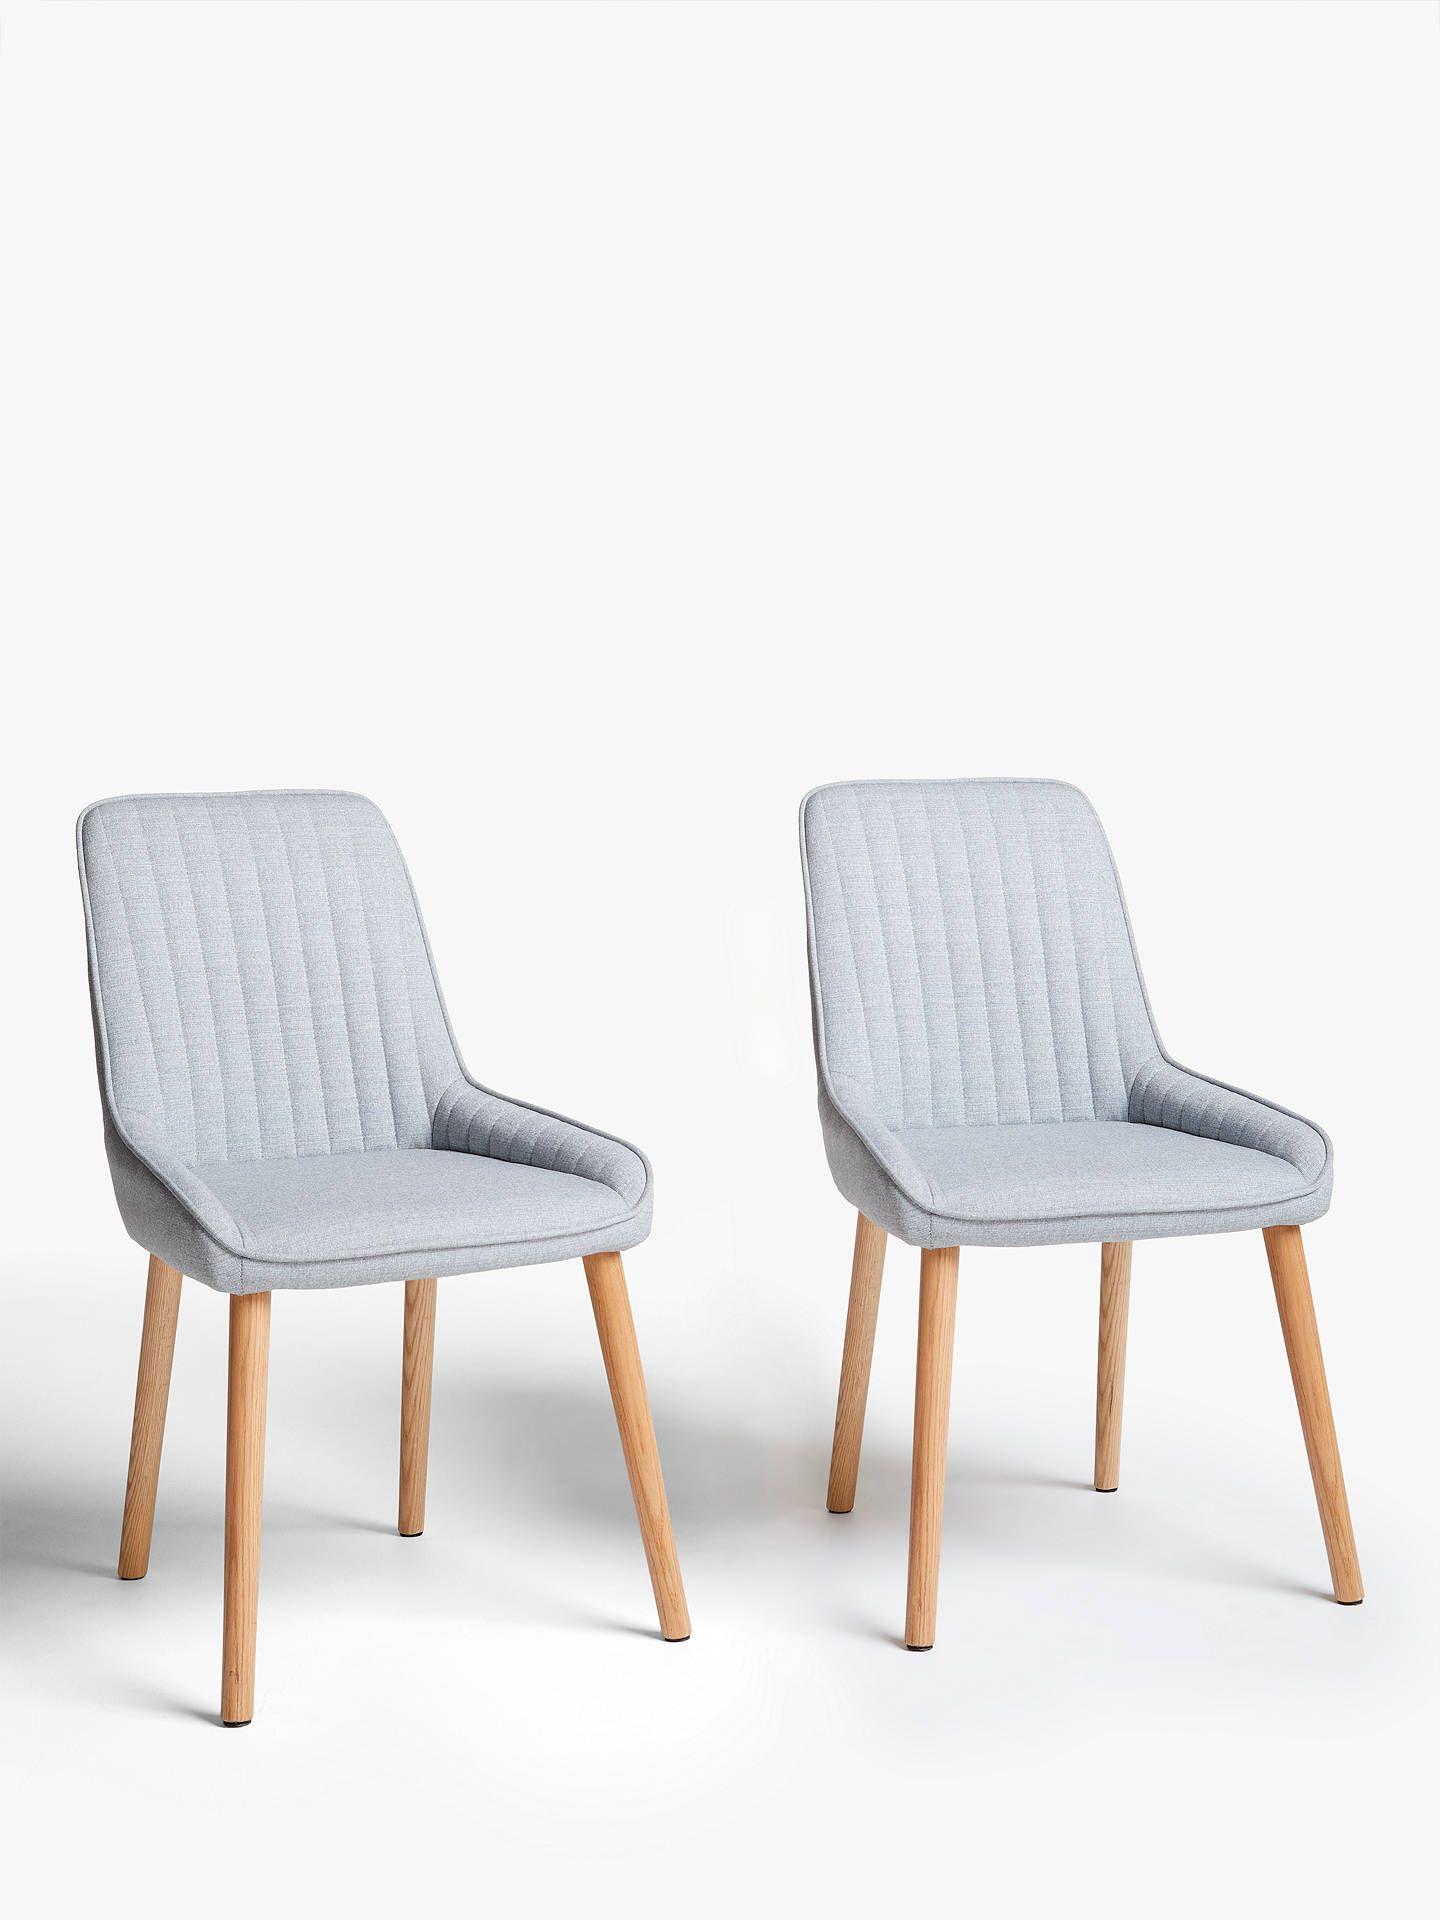 John Lewis & Partners Toronto Side Dining Chairs, Set of 9, Grey ...